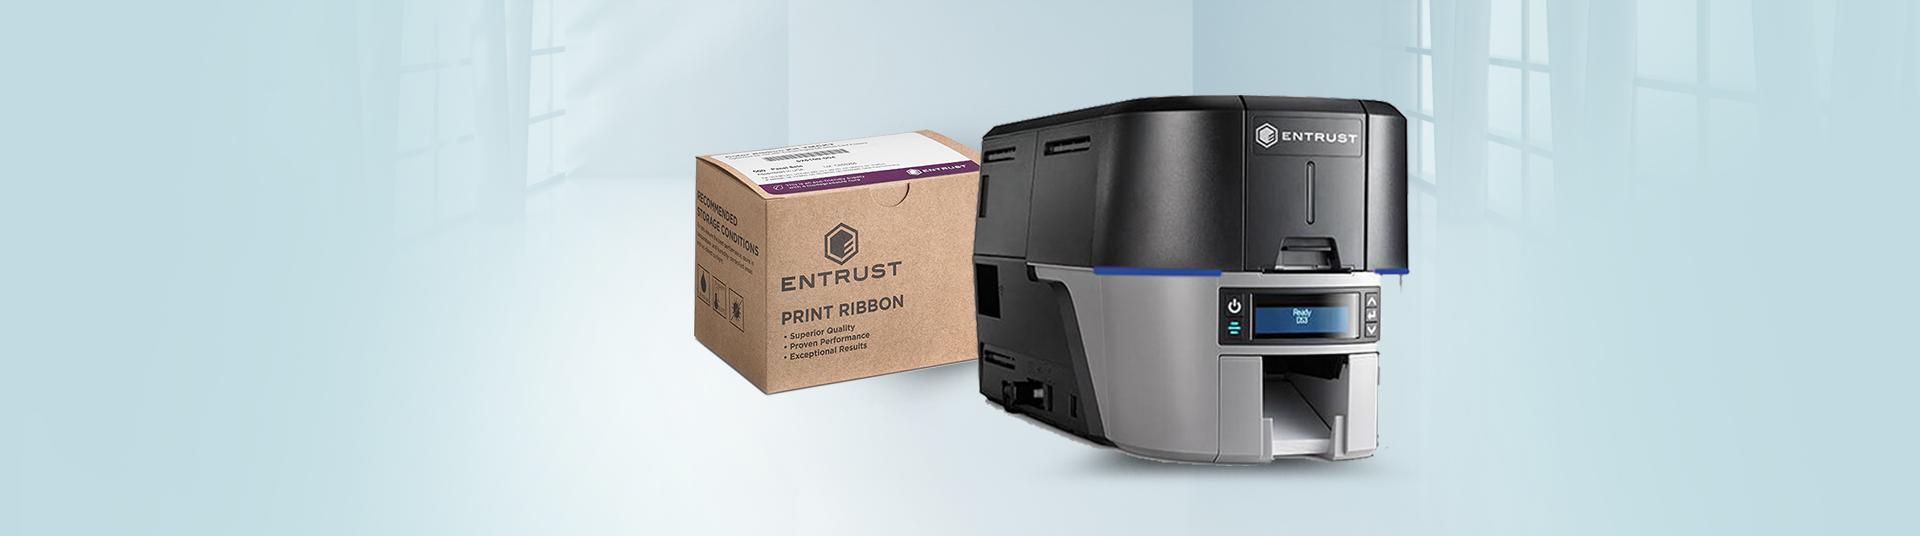 Entrust Datacard Sigma SL3 ID Card Printer